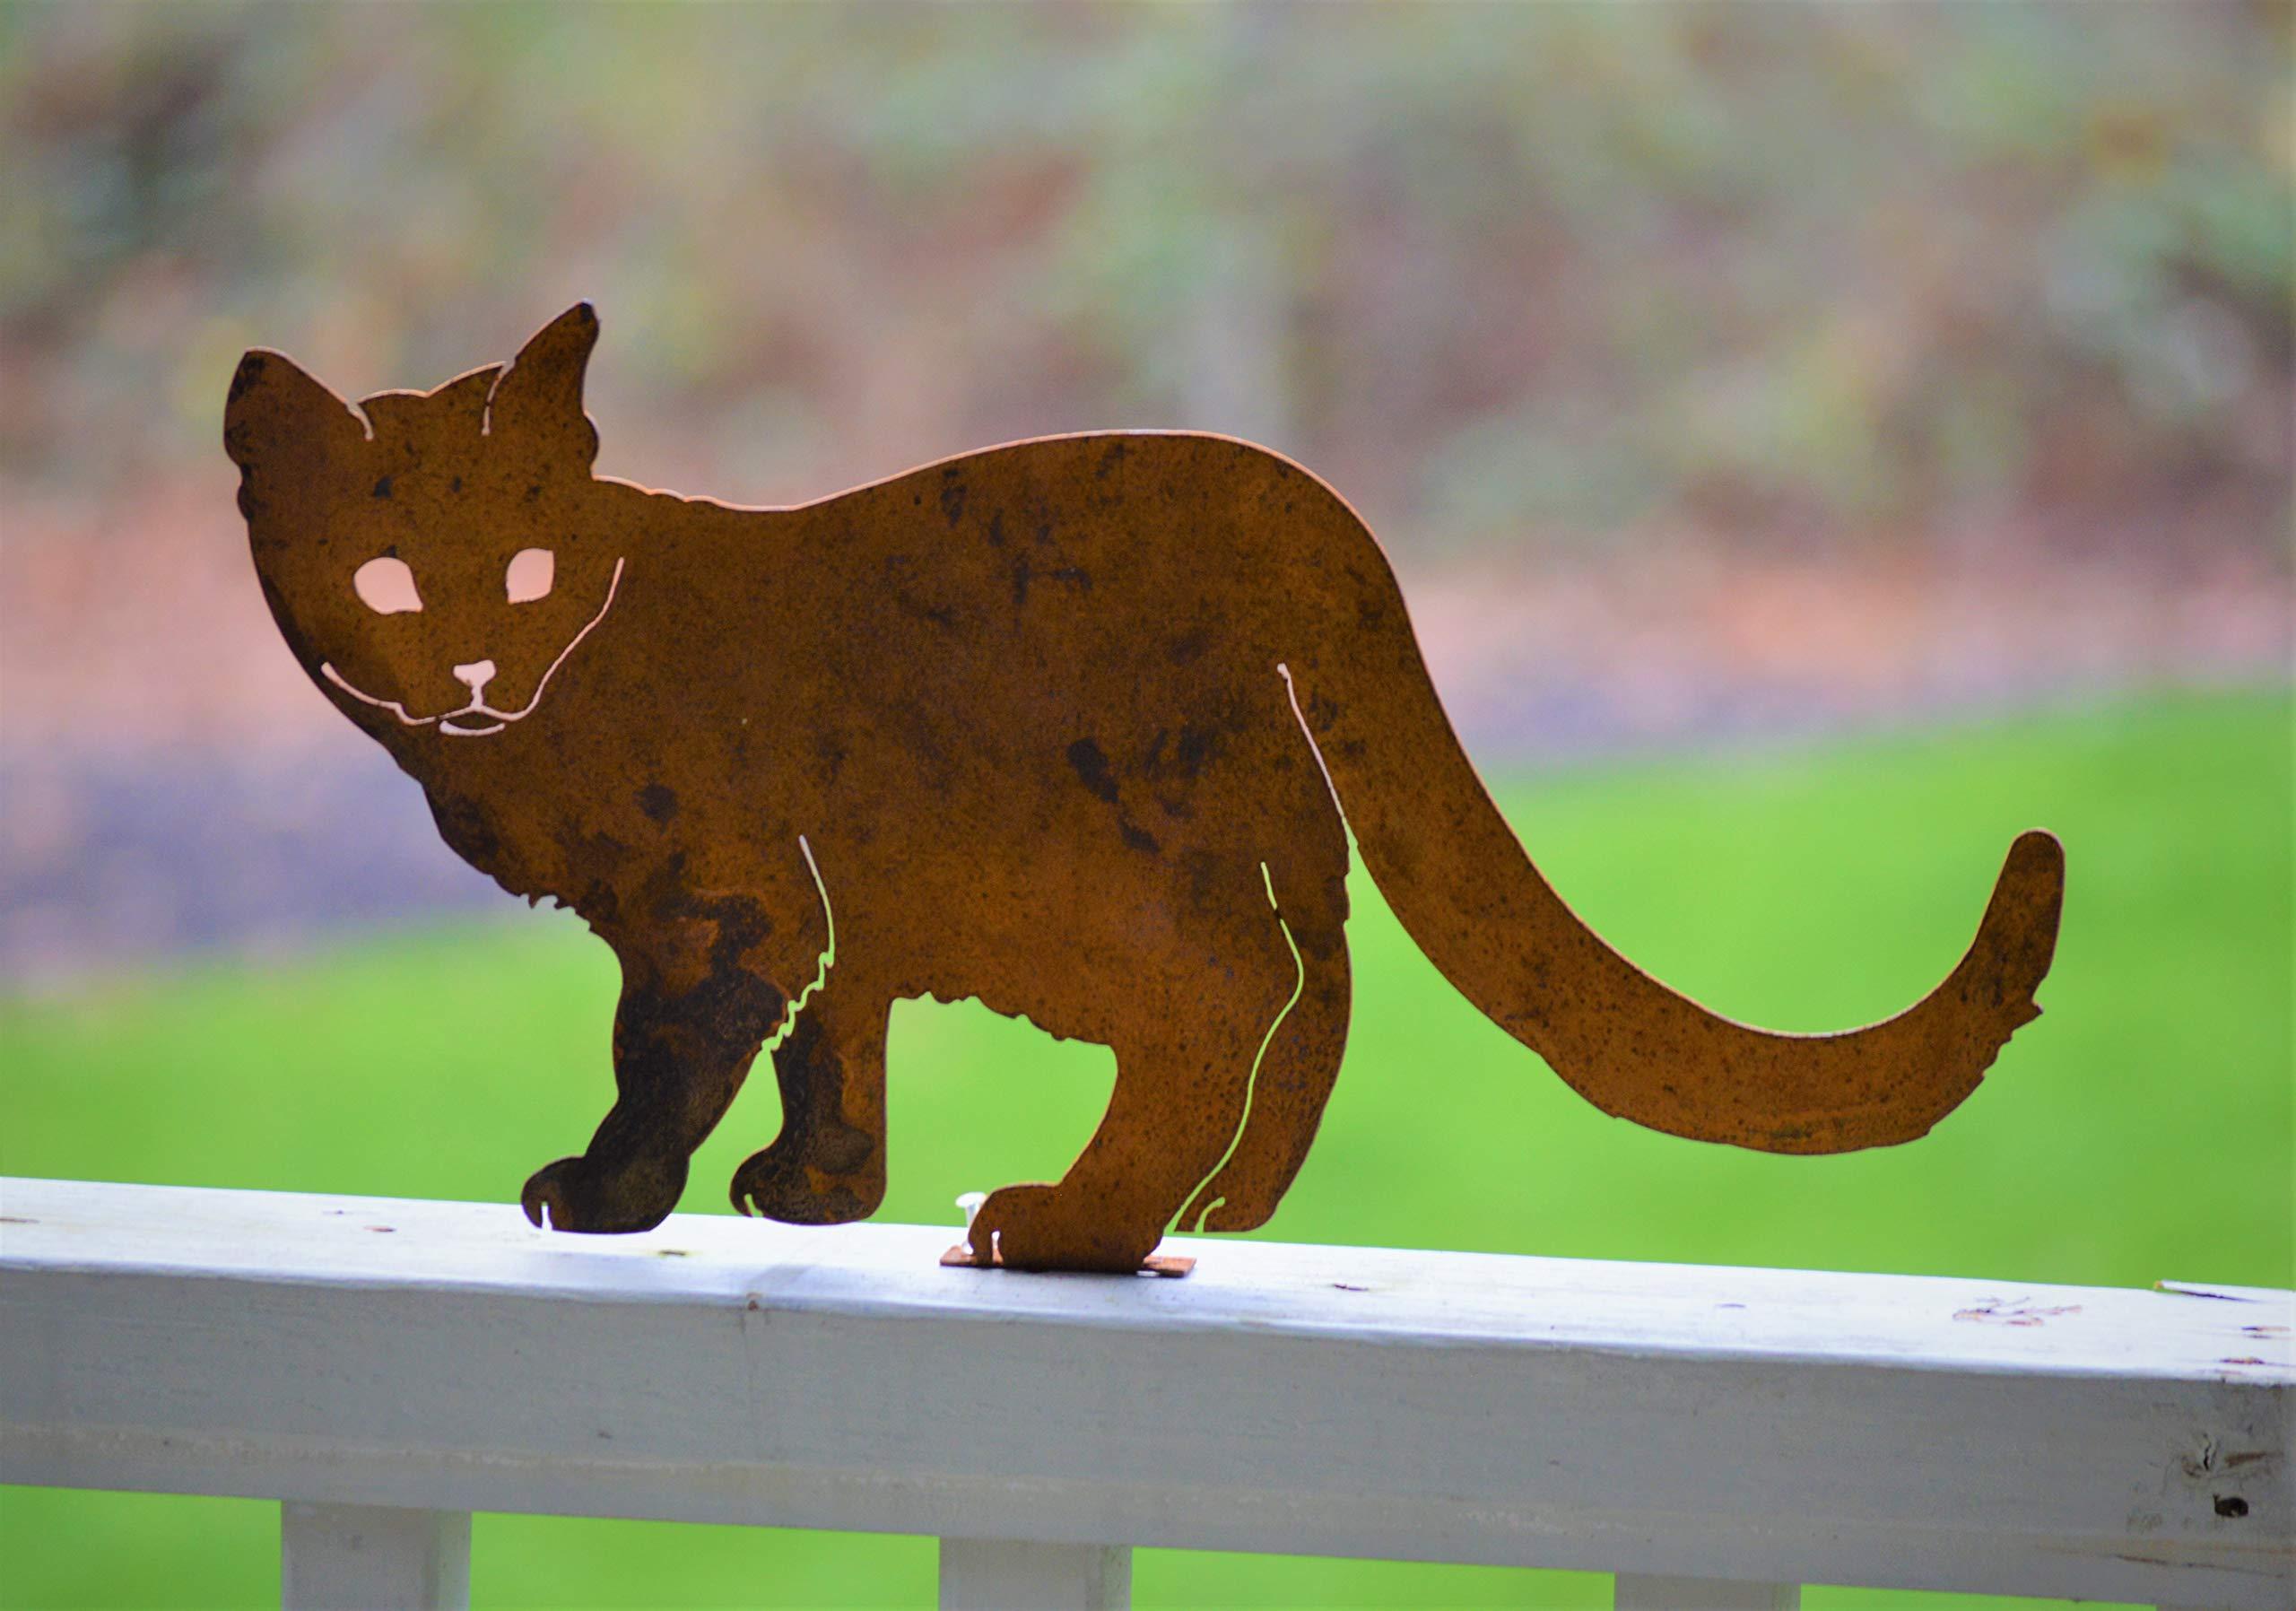 Elegant Garden Design Walking Cat, Steel Silhouette with Rusty Patina